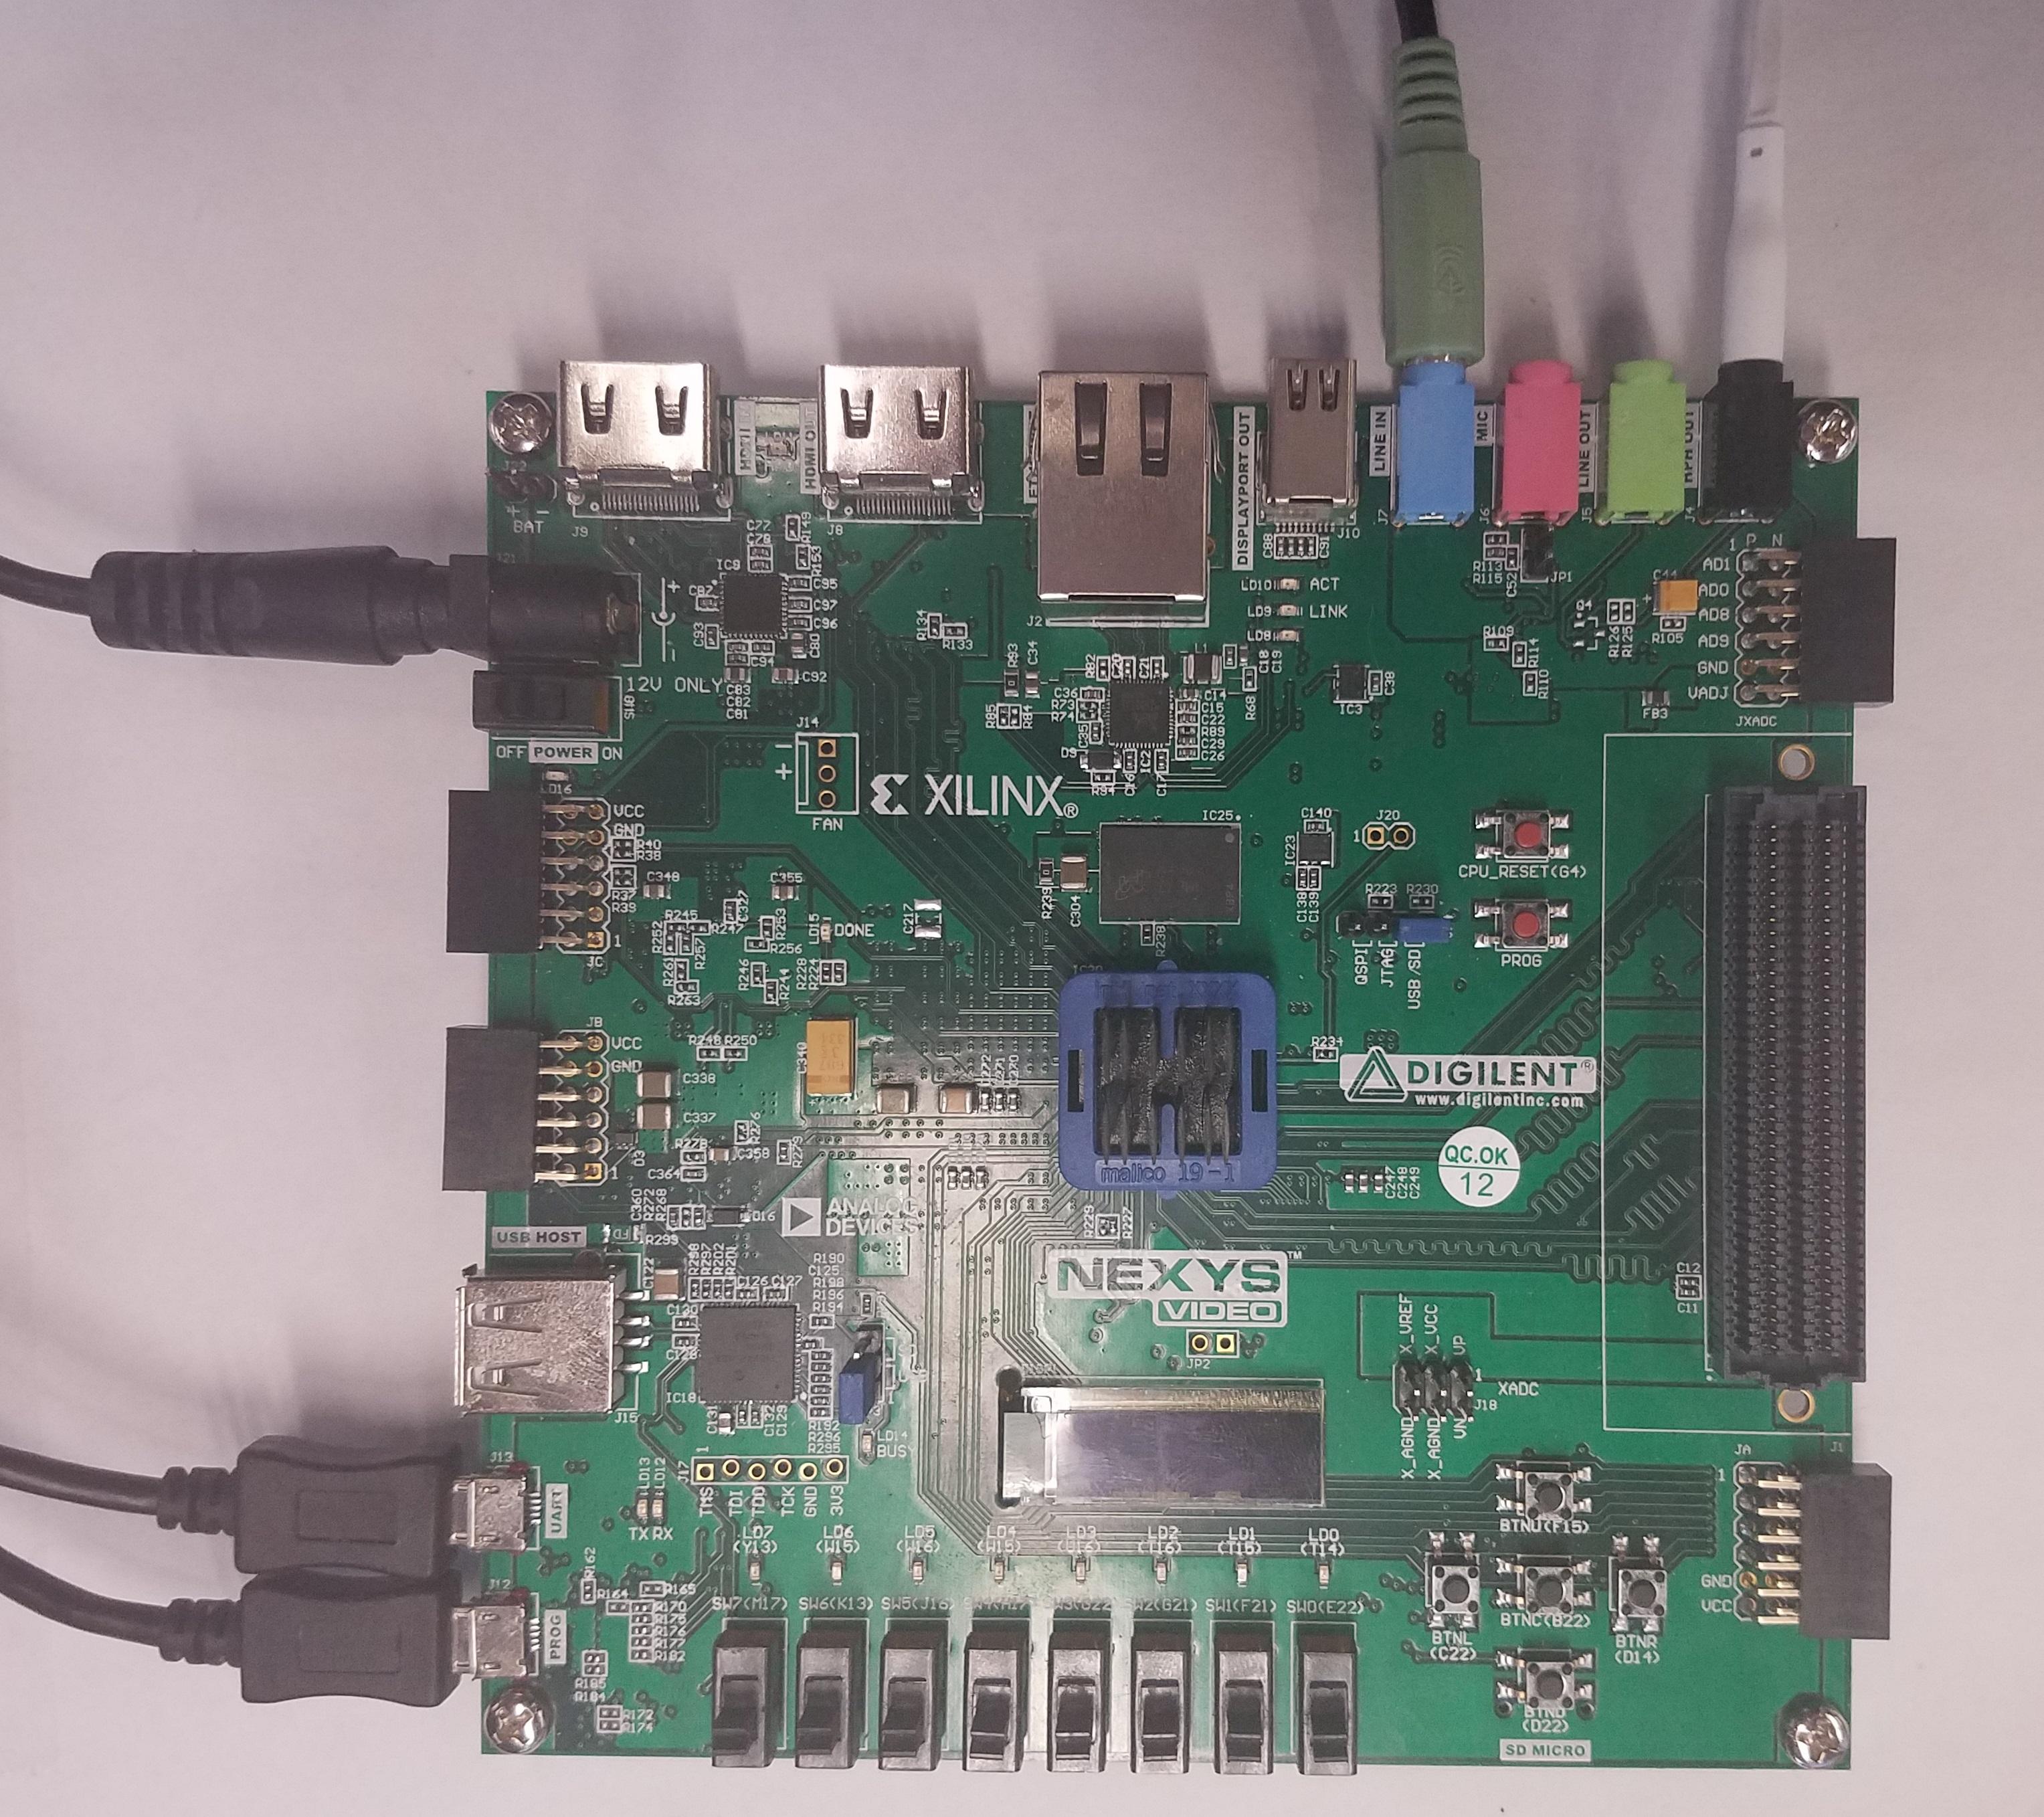 learn:programmable-logic:tutorials:nexys-video-dma-audio-demo:nv-dma.jpg